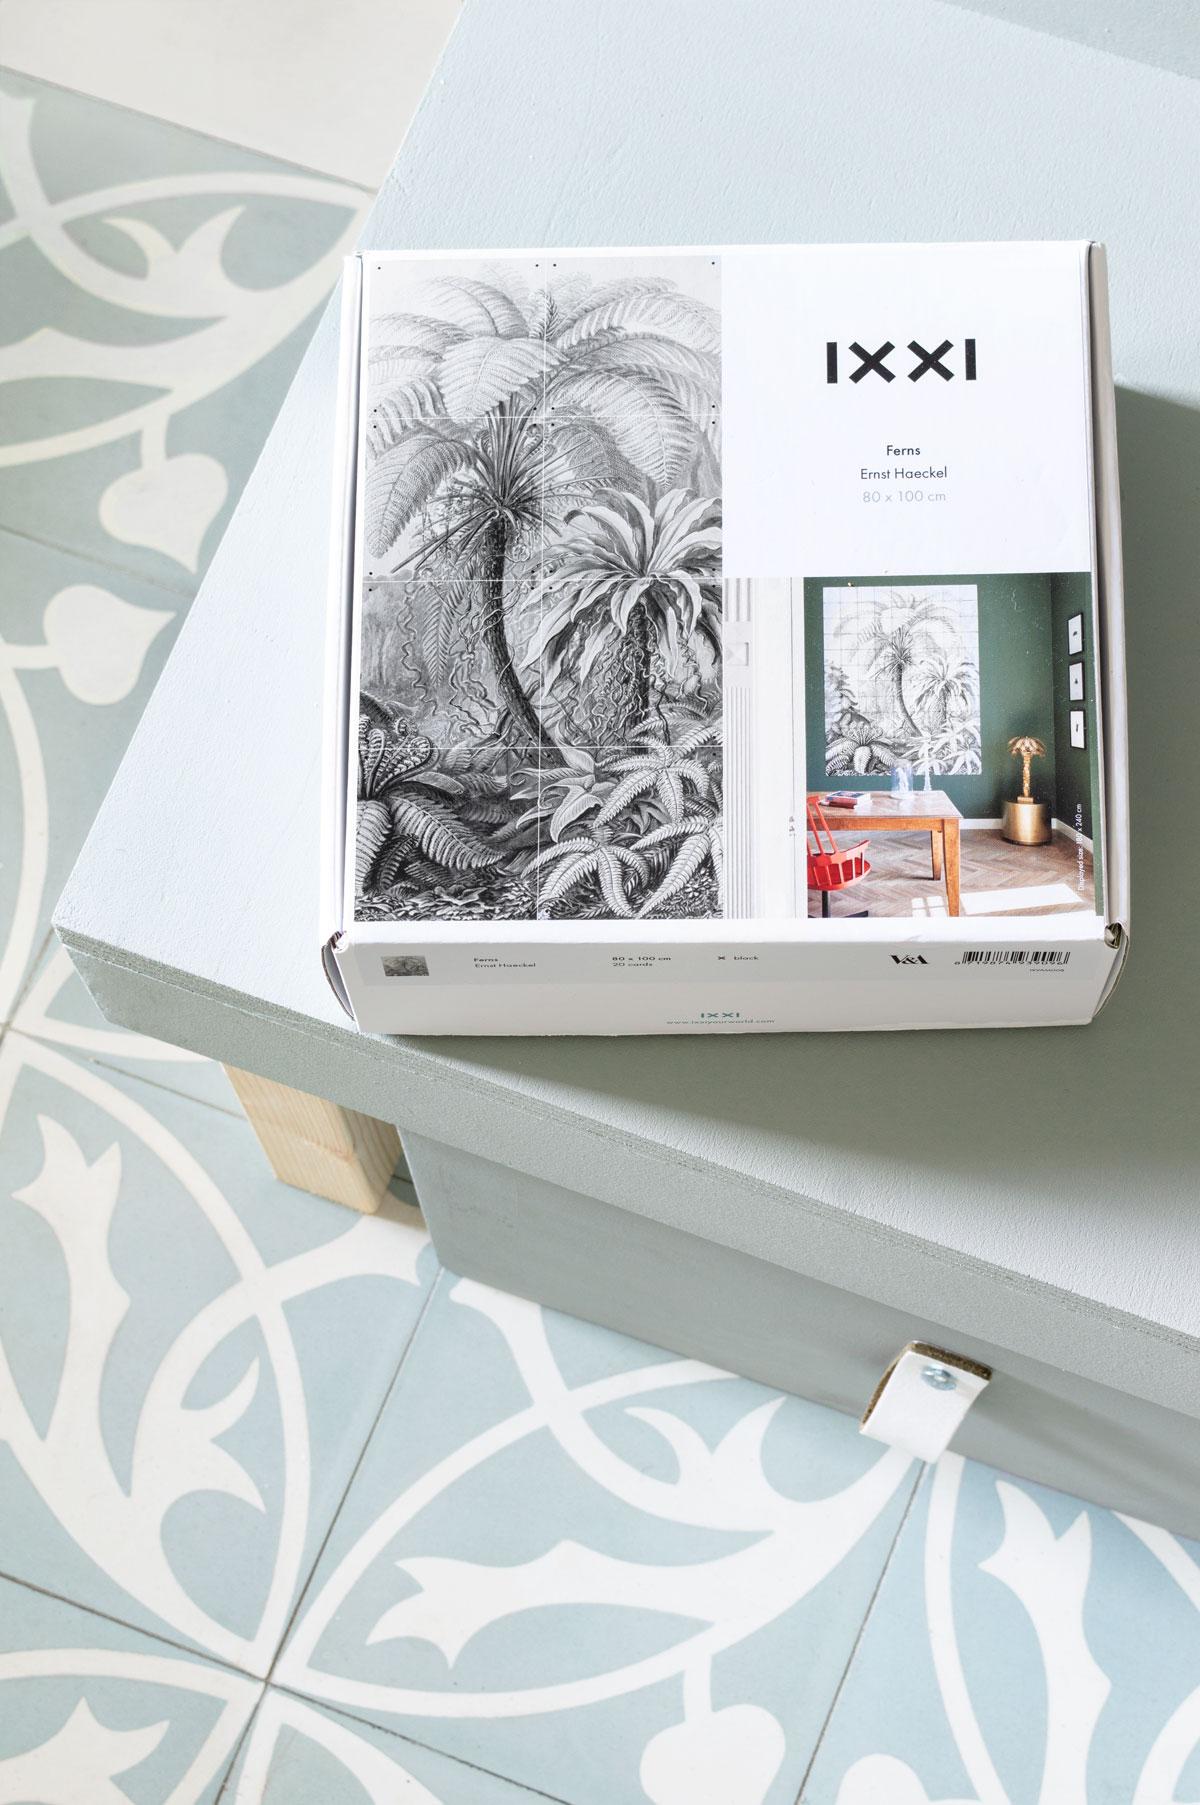 IXXI Ferns hal - Tanja van Hoogdalem